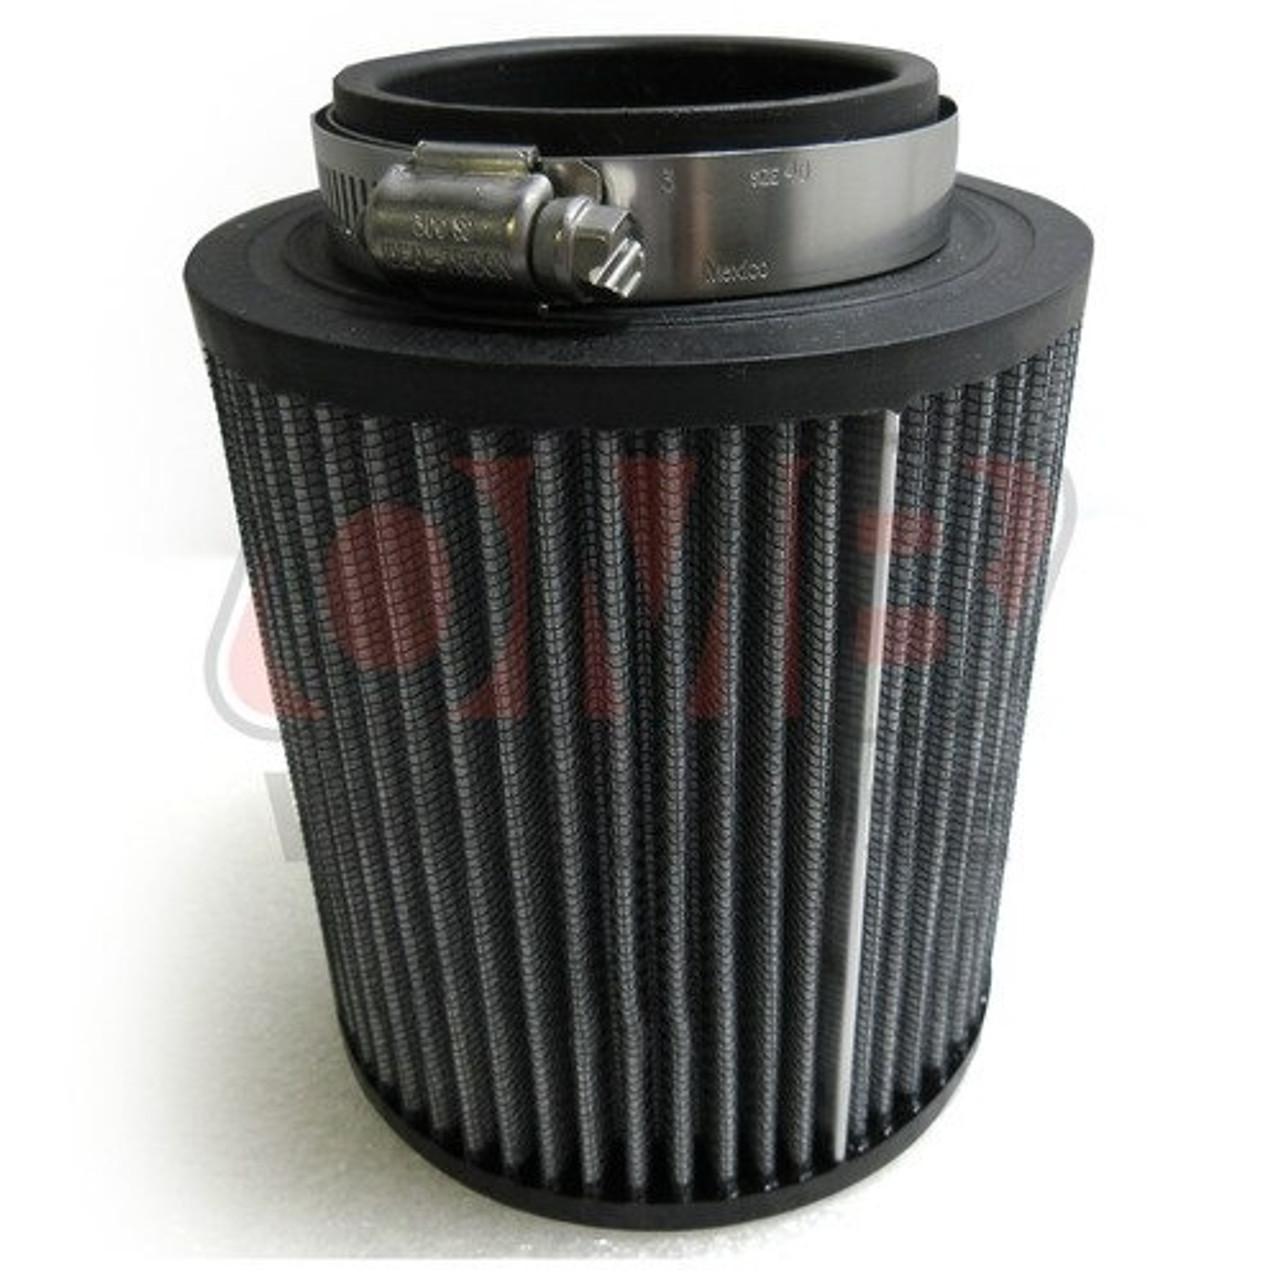 "Air Filter 4-1/2"" x 5"" x 2-7/16"" Fabric Straight"